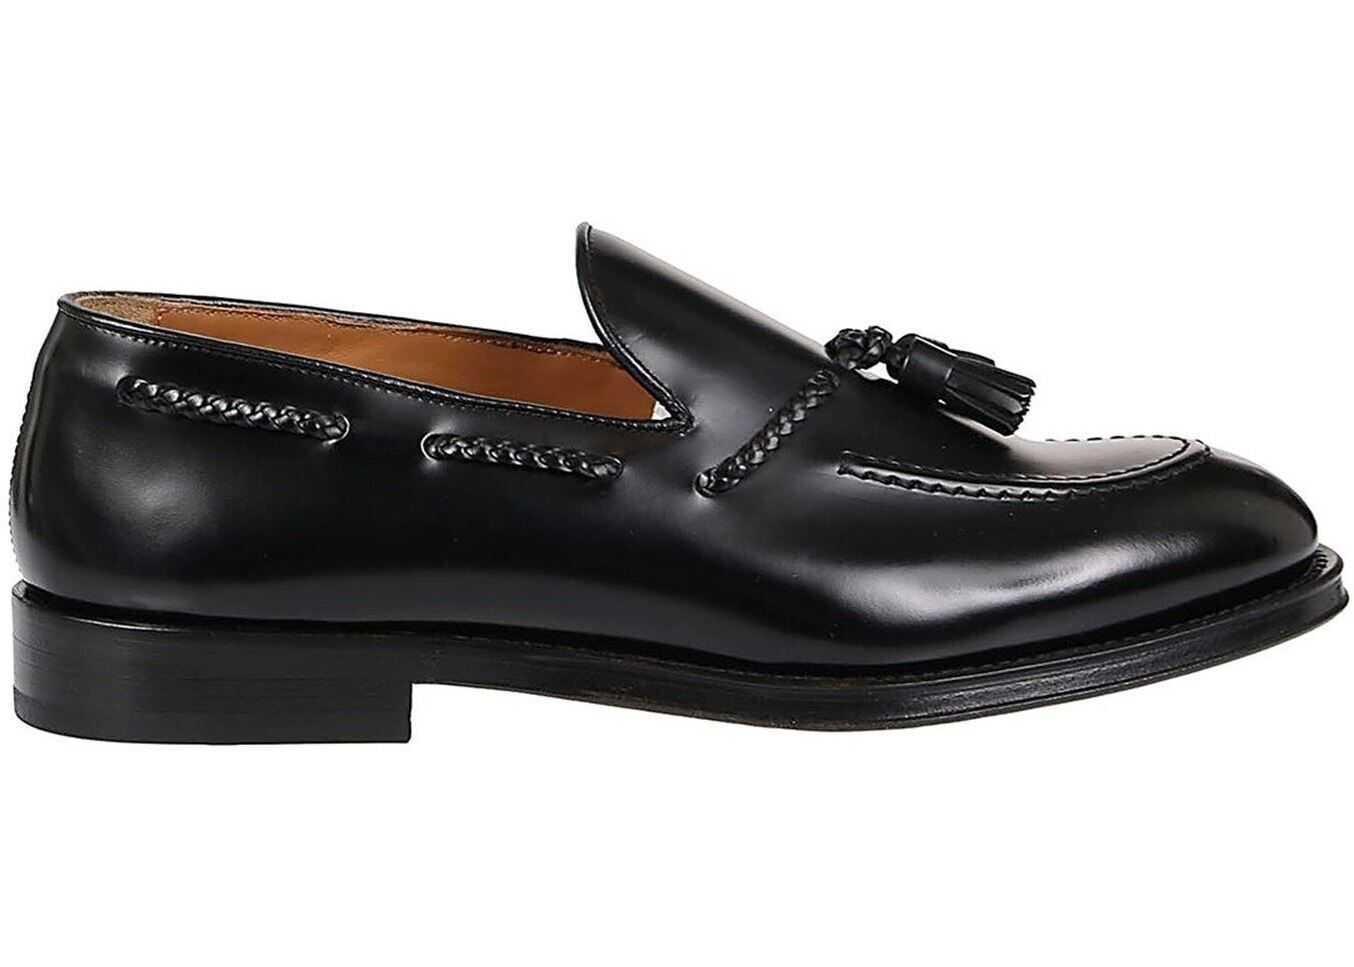 Doucal's Loafers With Tassels In Black DU1020ORVIUY007NN0 Black imagine b-mall.ro